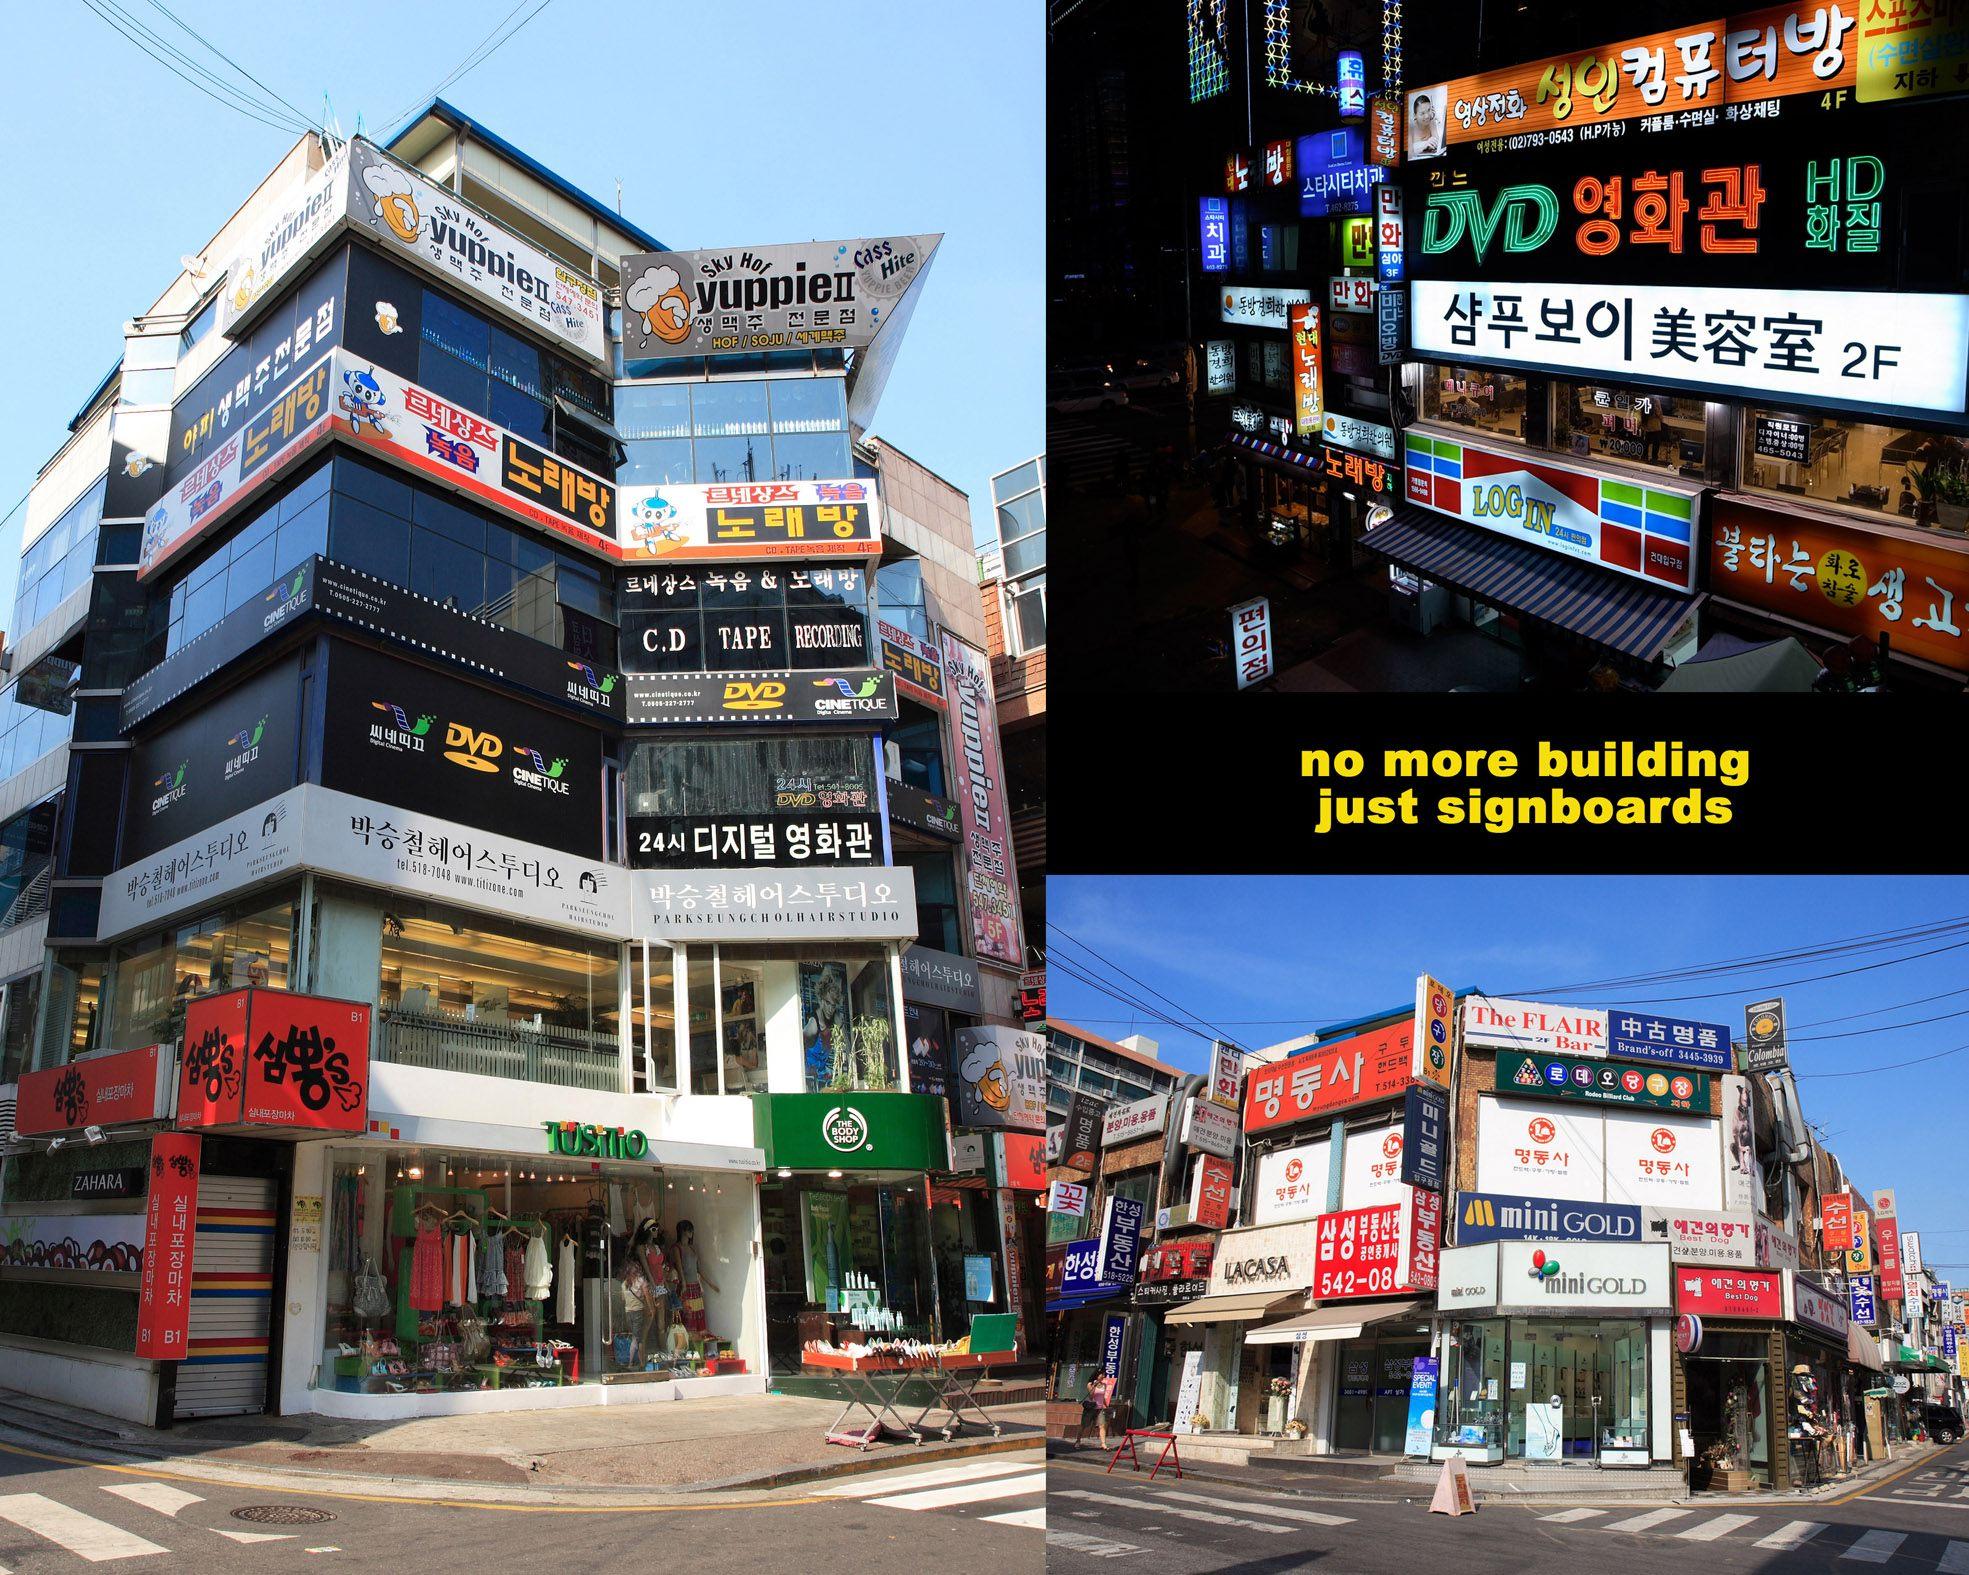 02 jamwon 40.6 no more building.jpg